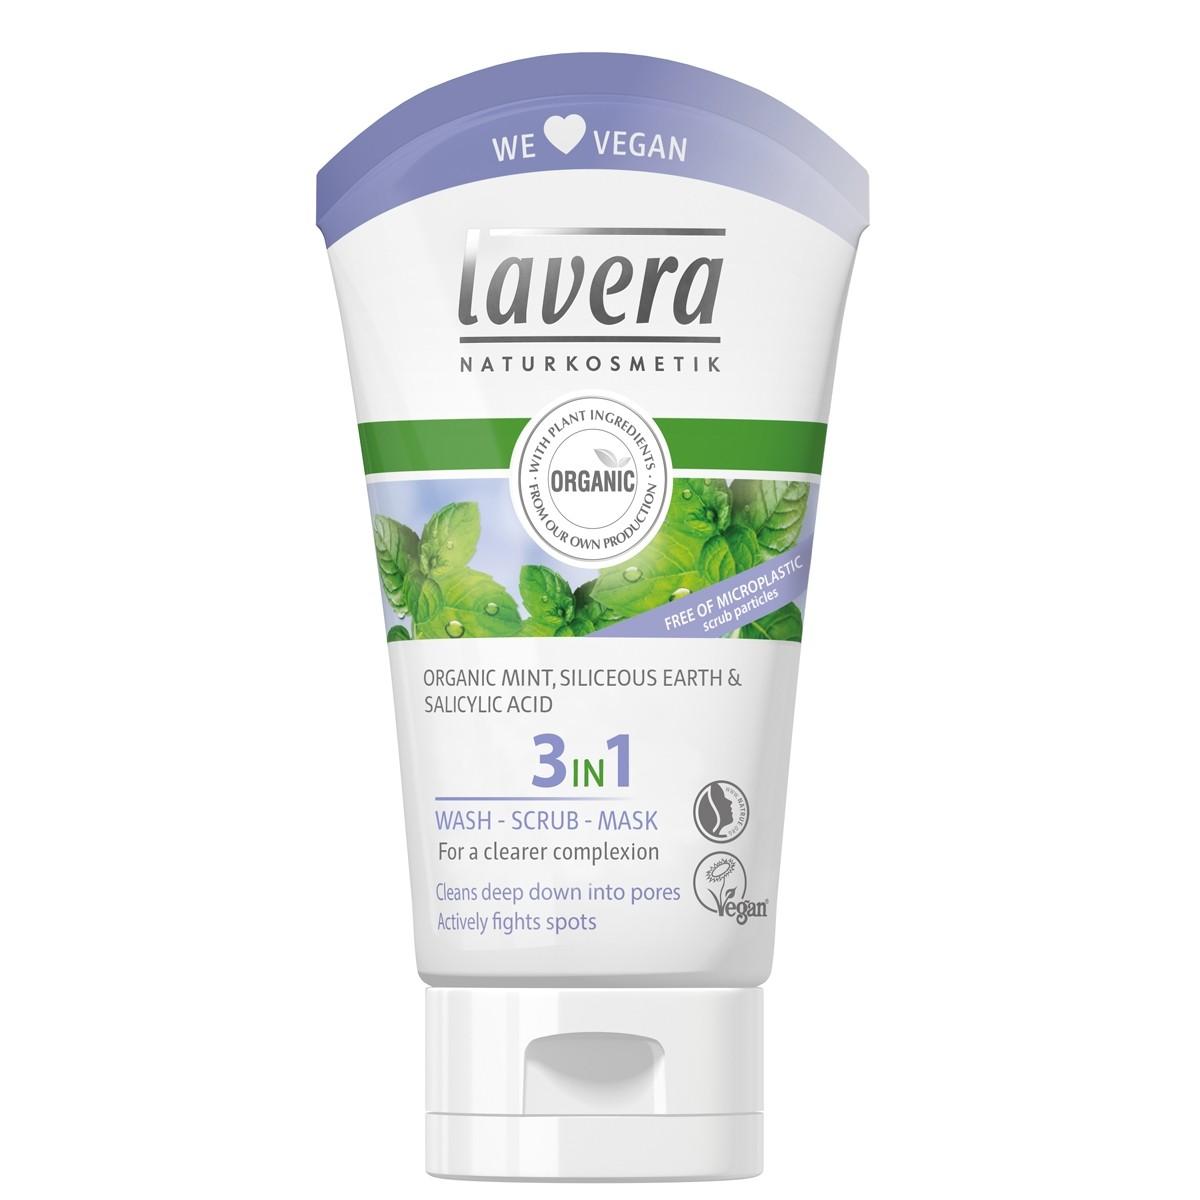 Lavera 3 in 1 Organic Face Wash Scrub & Mask